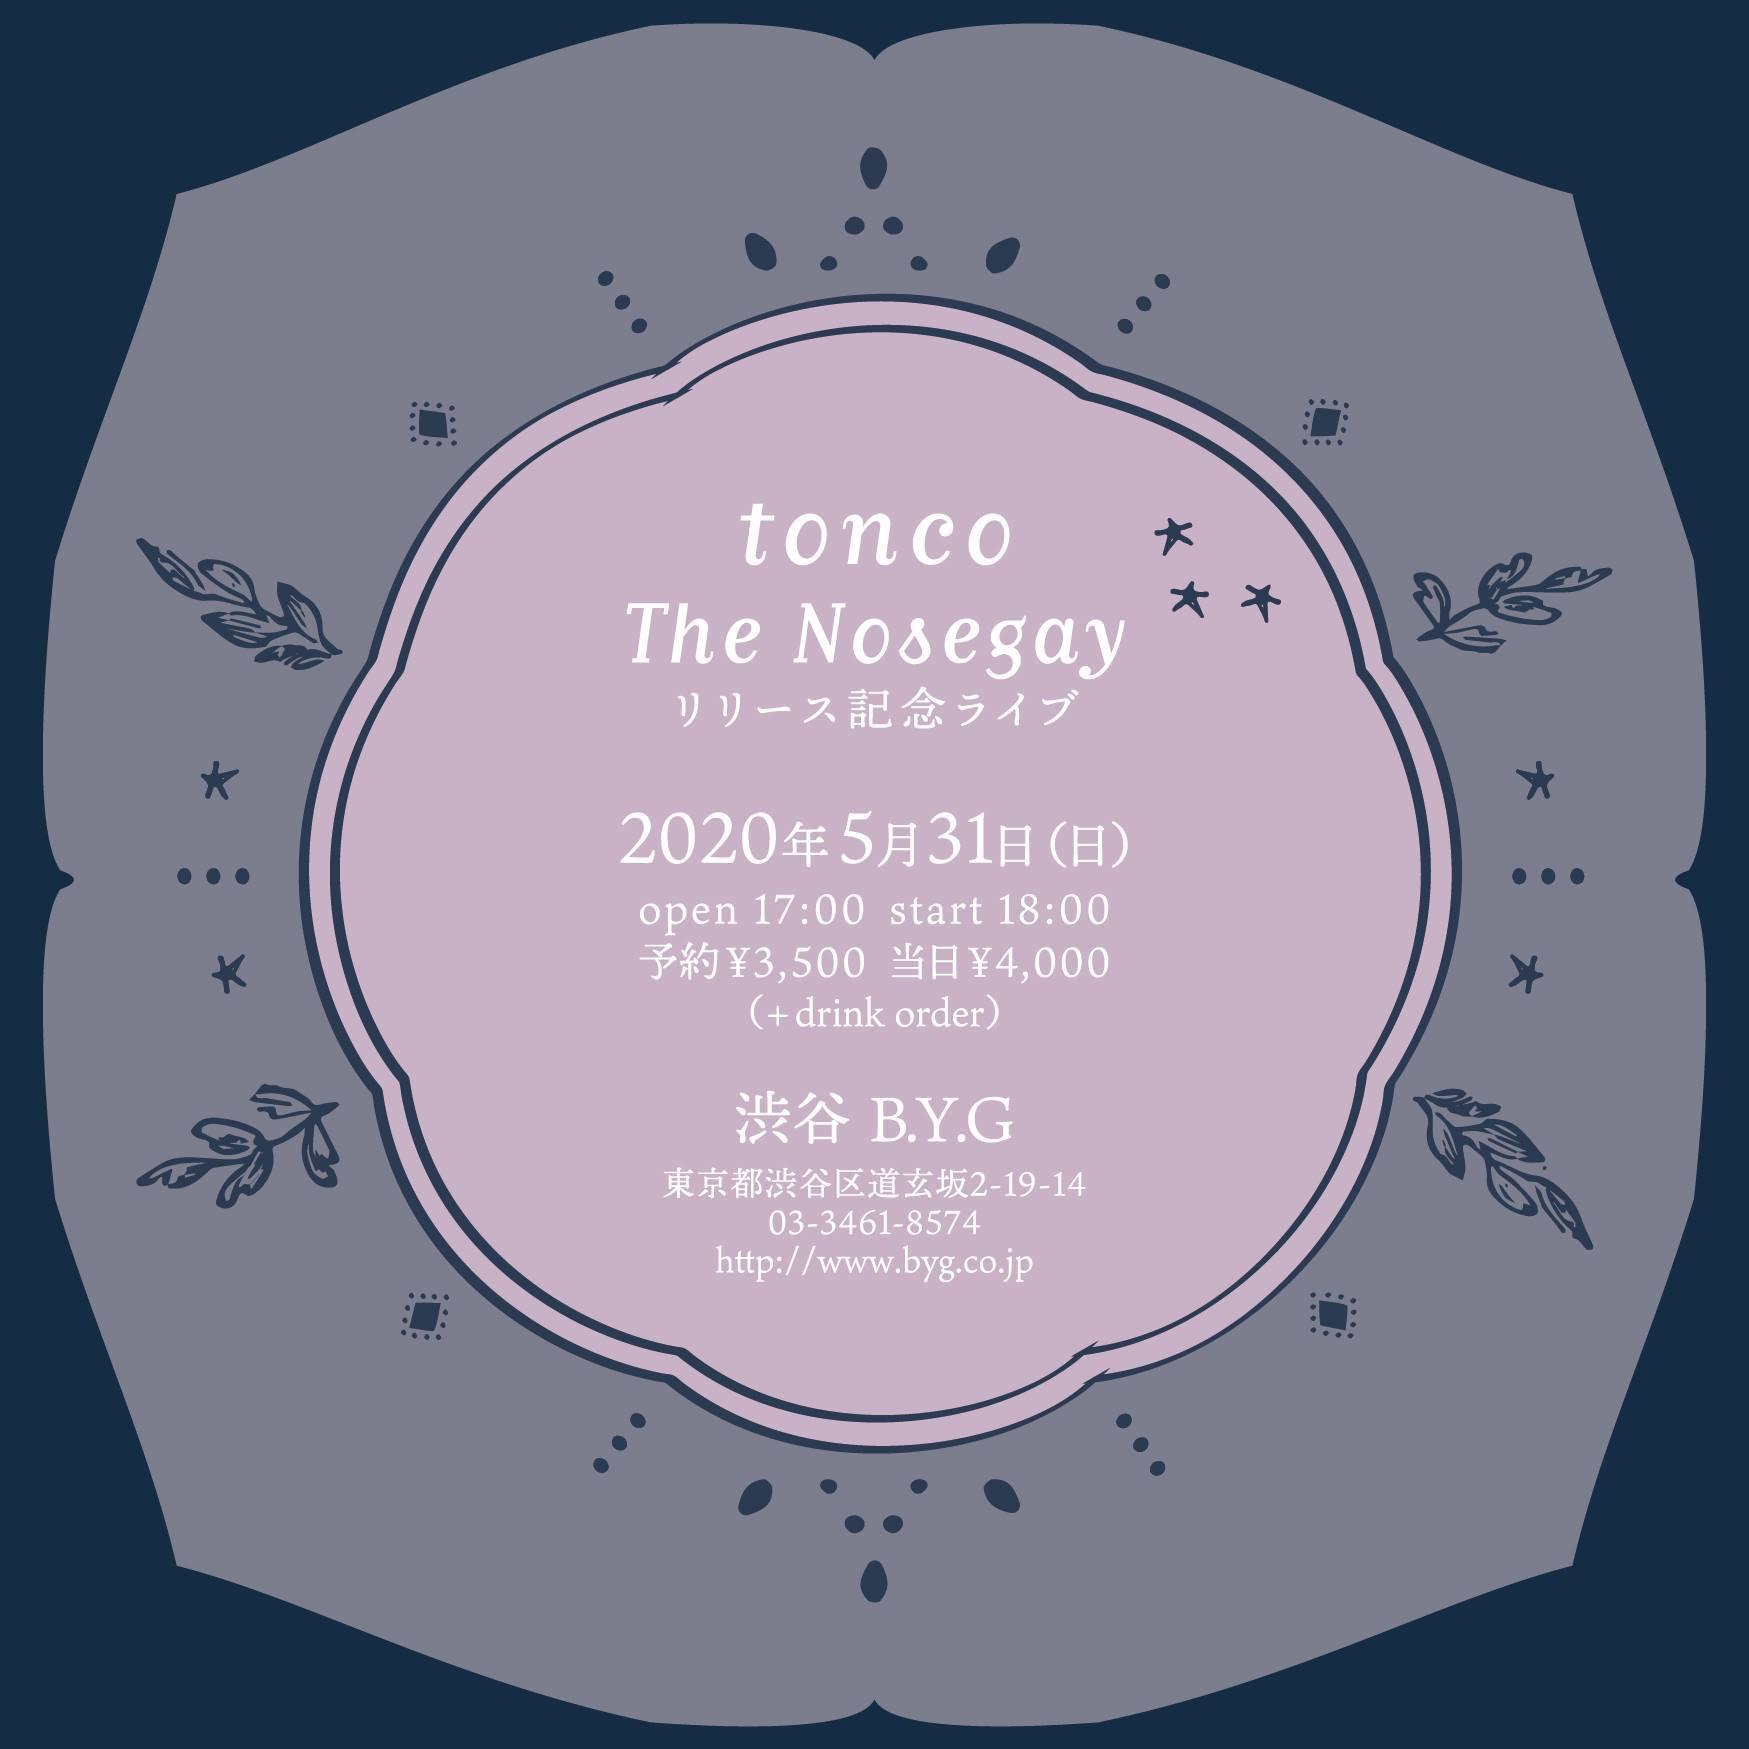 tonco The Nosegayリリース記念ライブの振替公演が5/31(日)に決定_b0185236_12104686.jpg